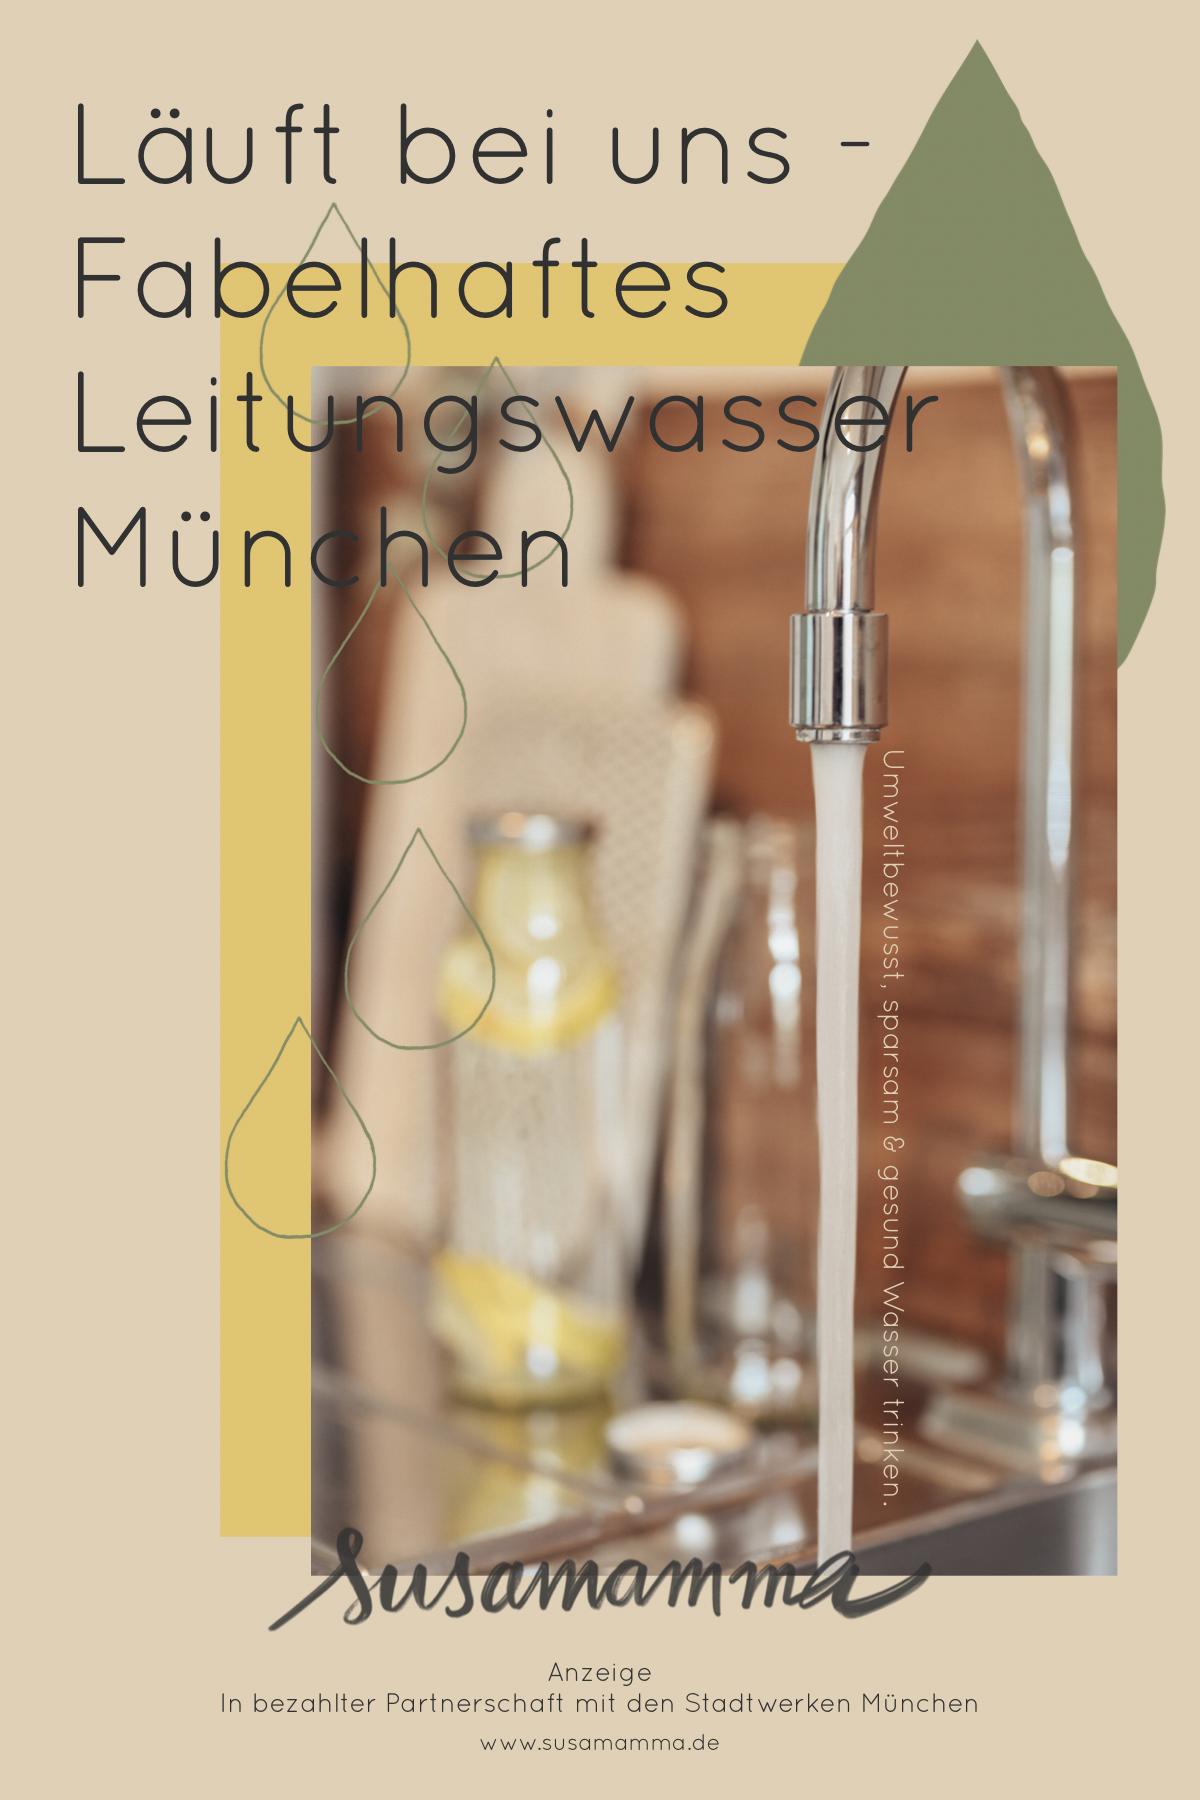 Läuft bei uns - Fabelhaftes Leitungswasser München